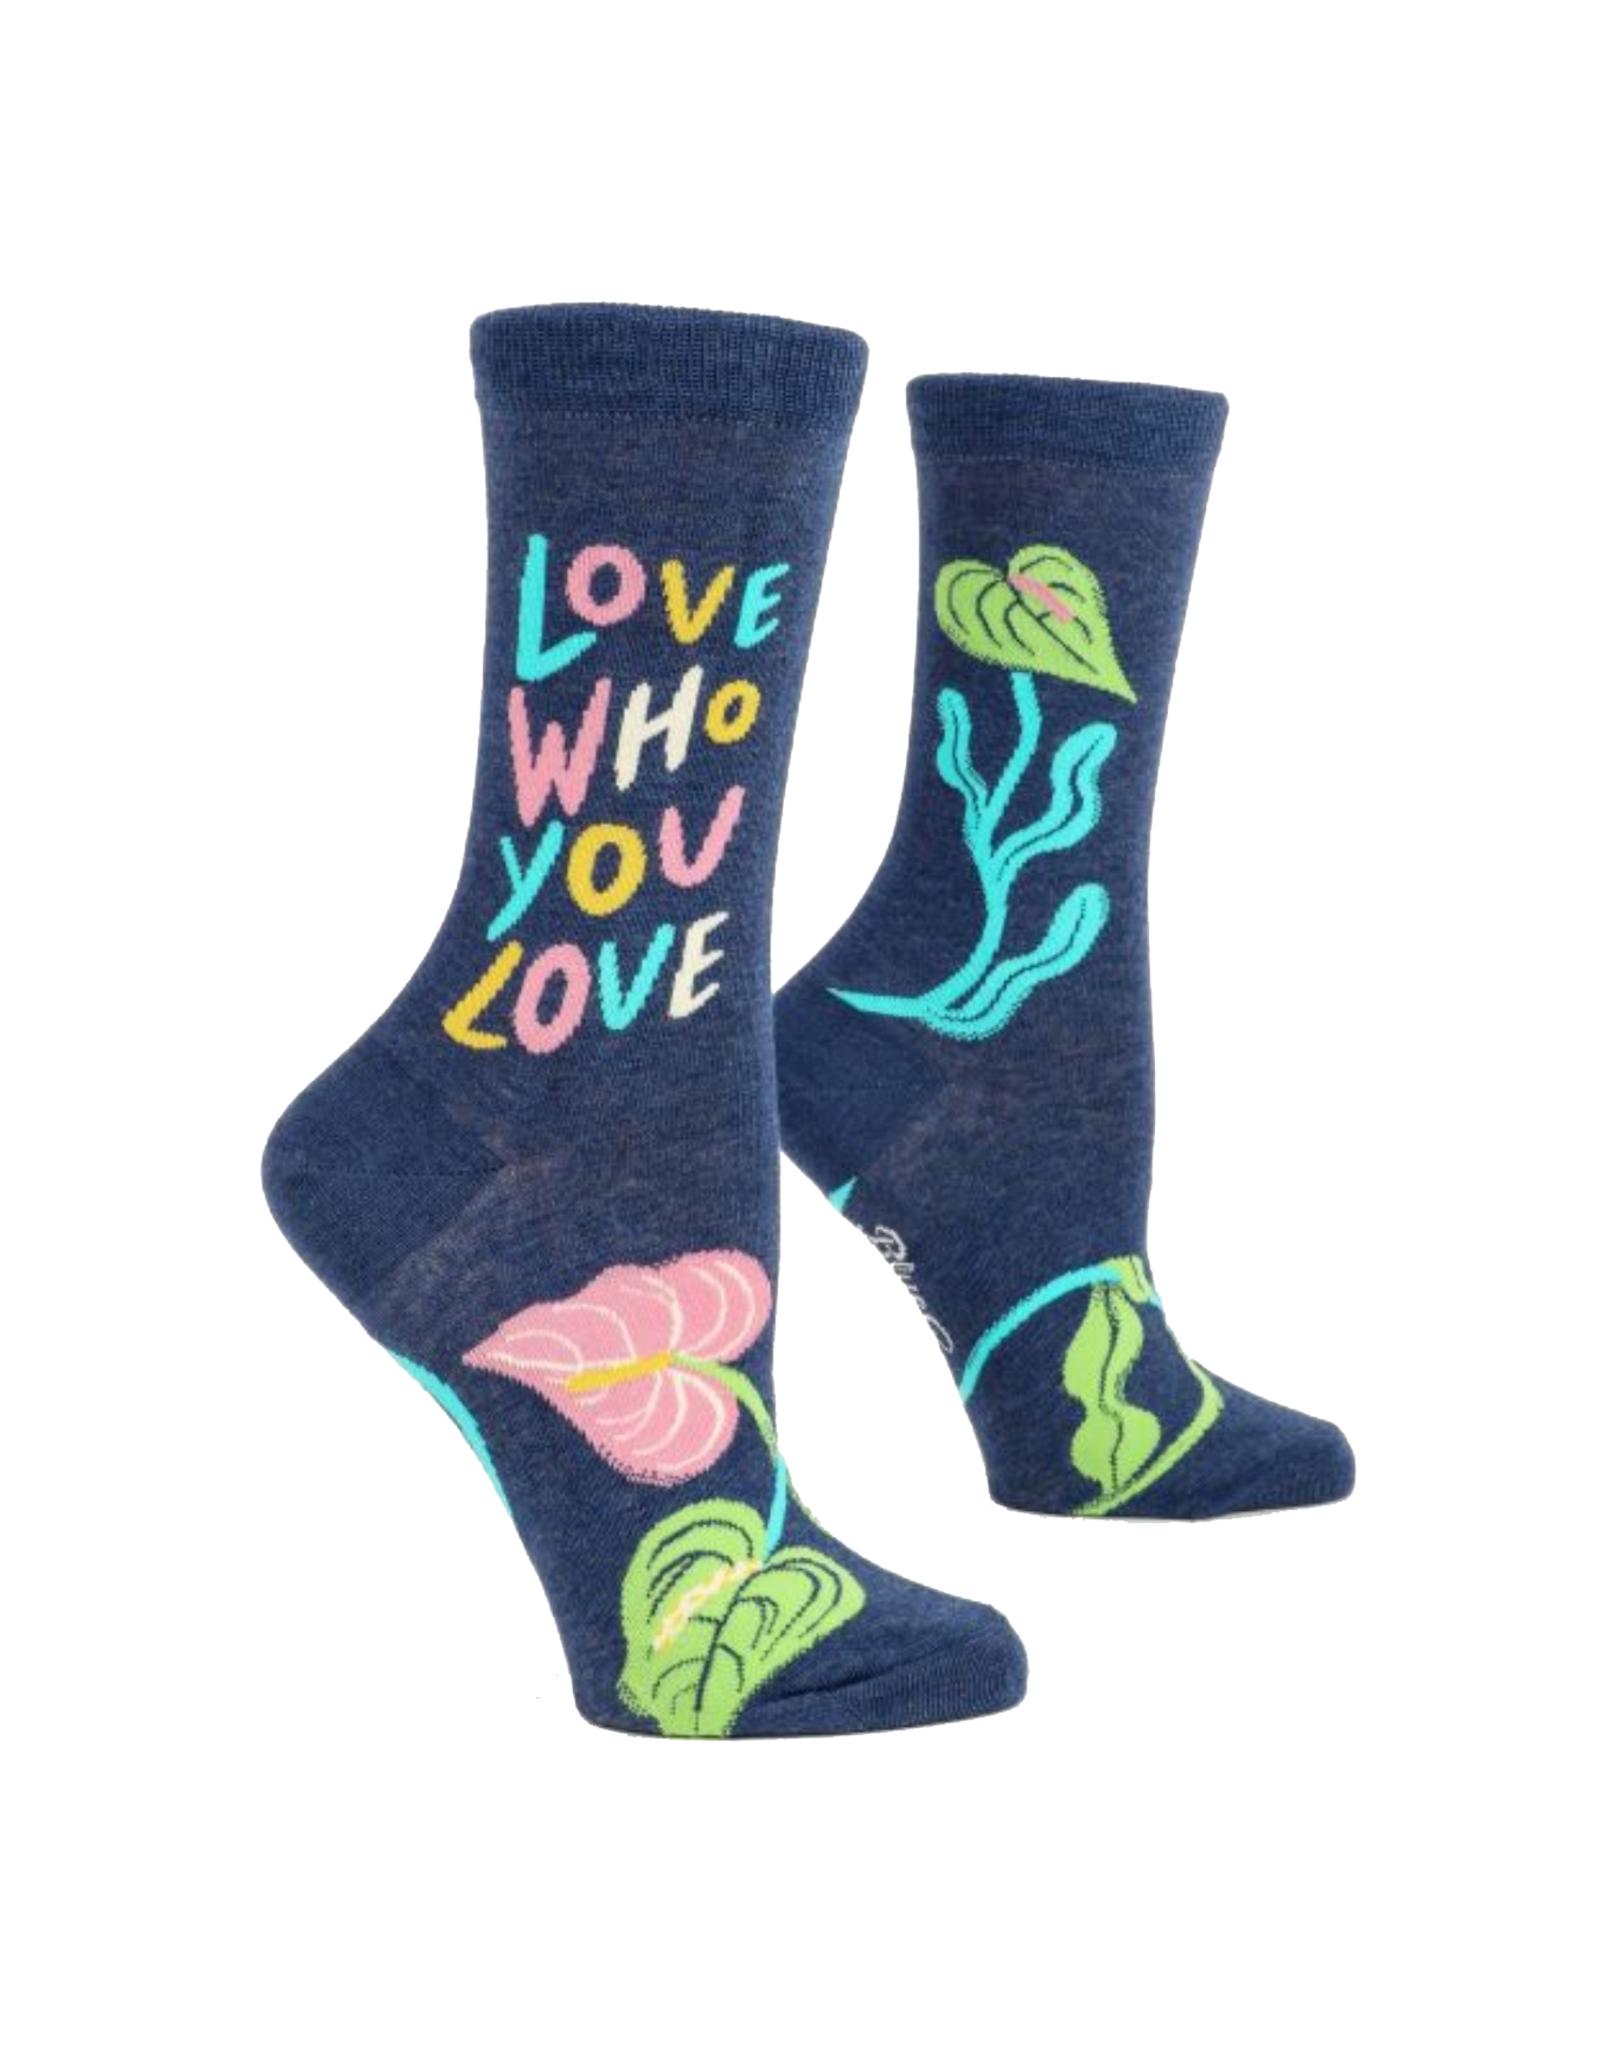 Love Who You Love Women's Socks